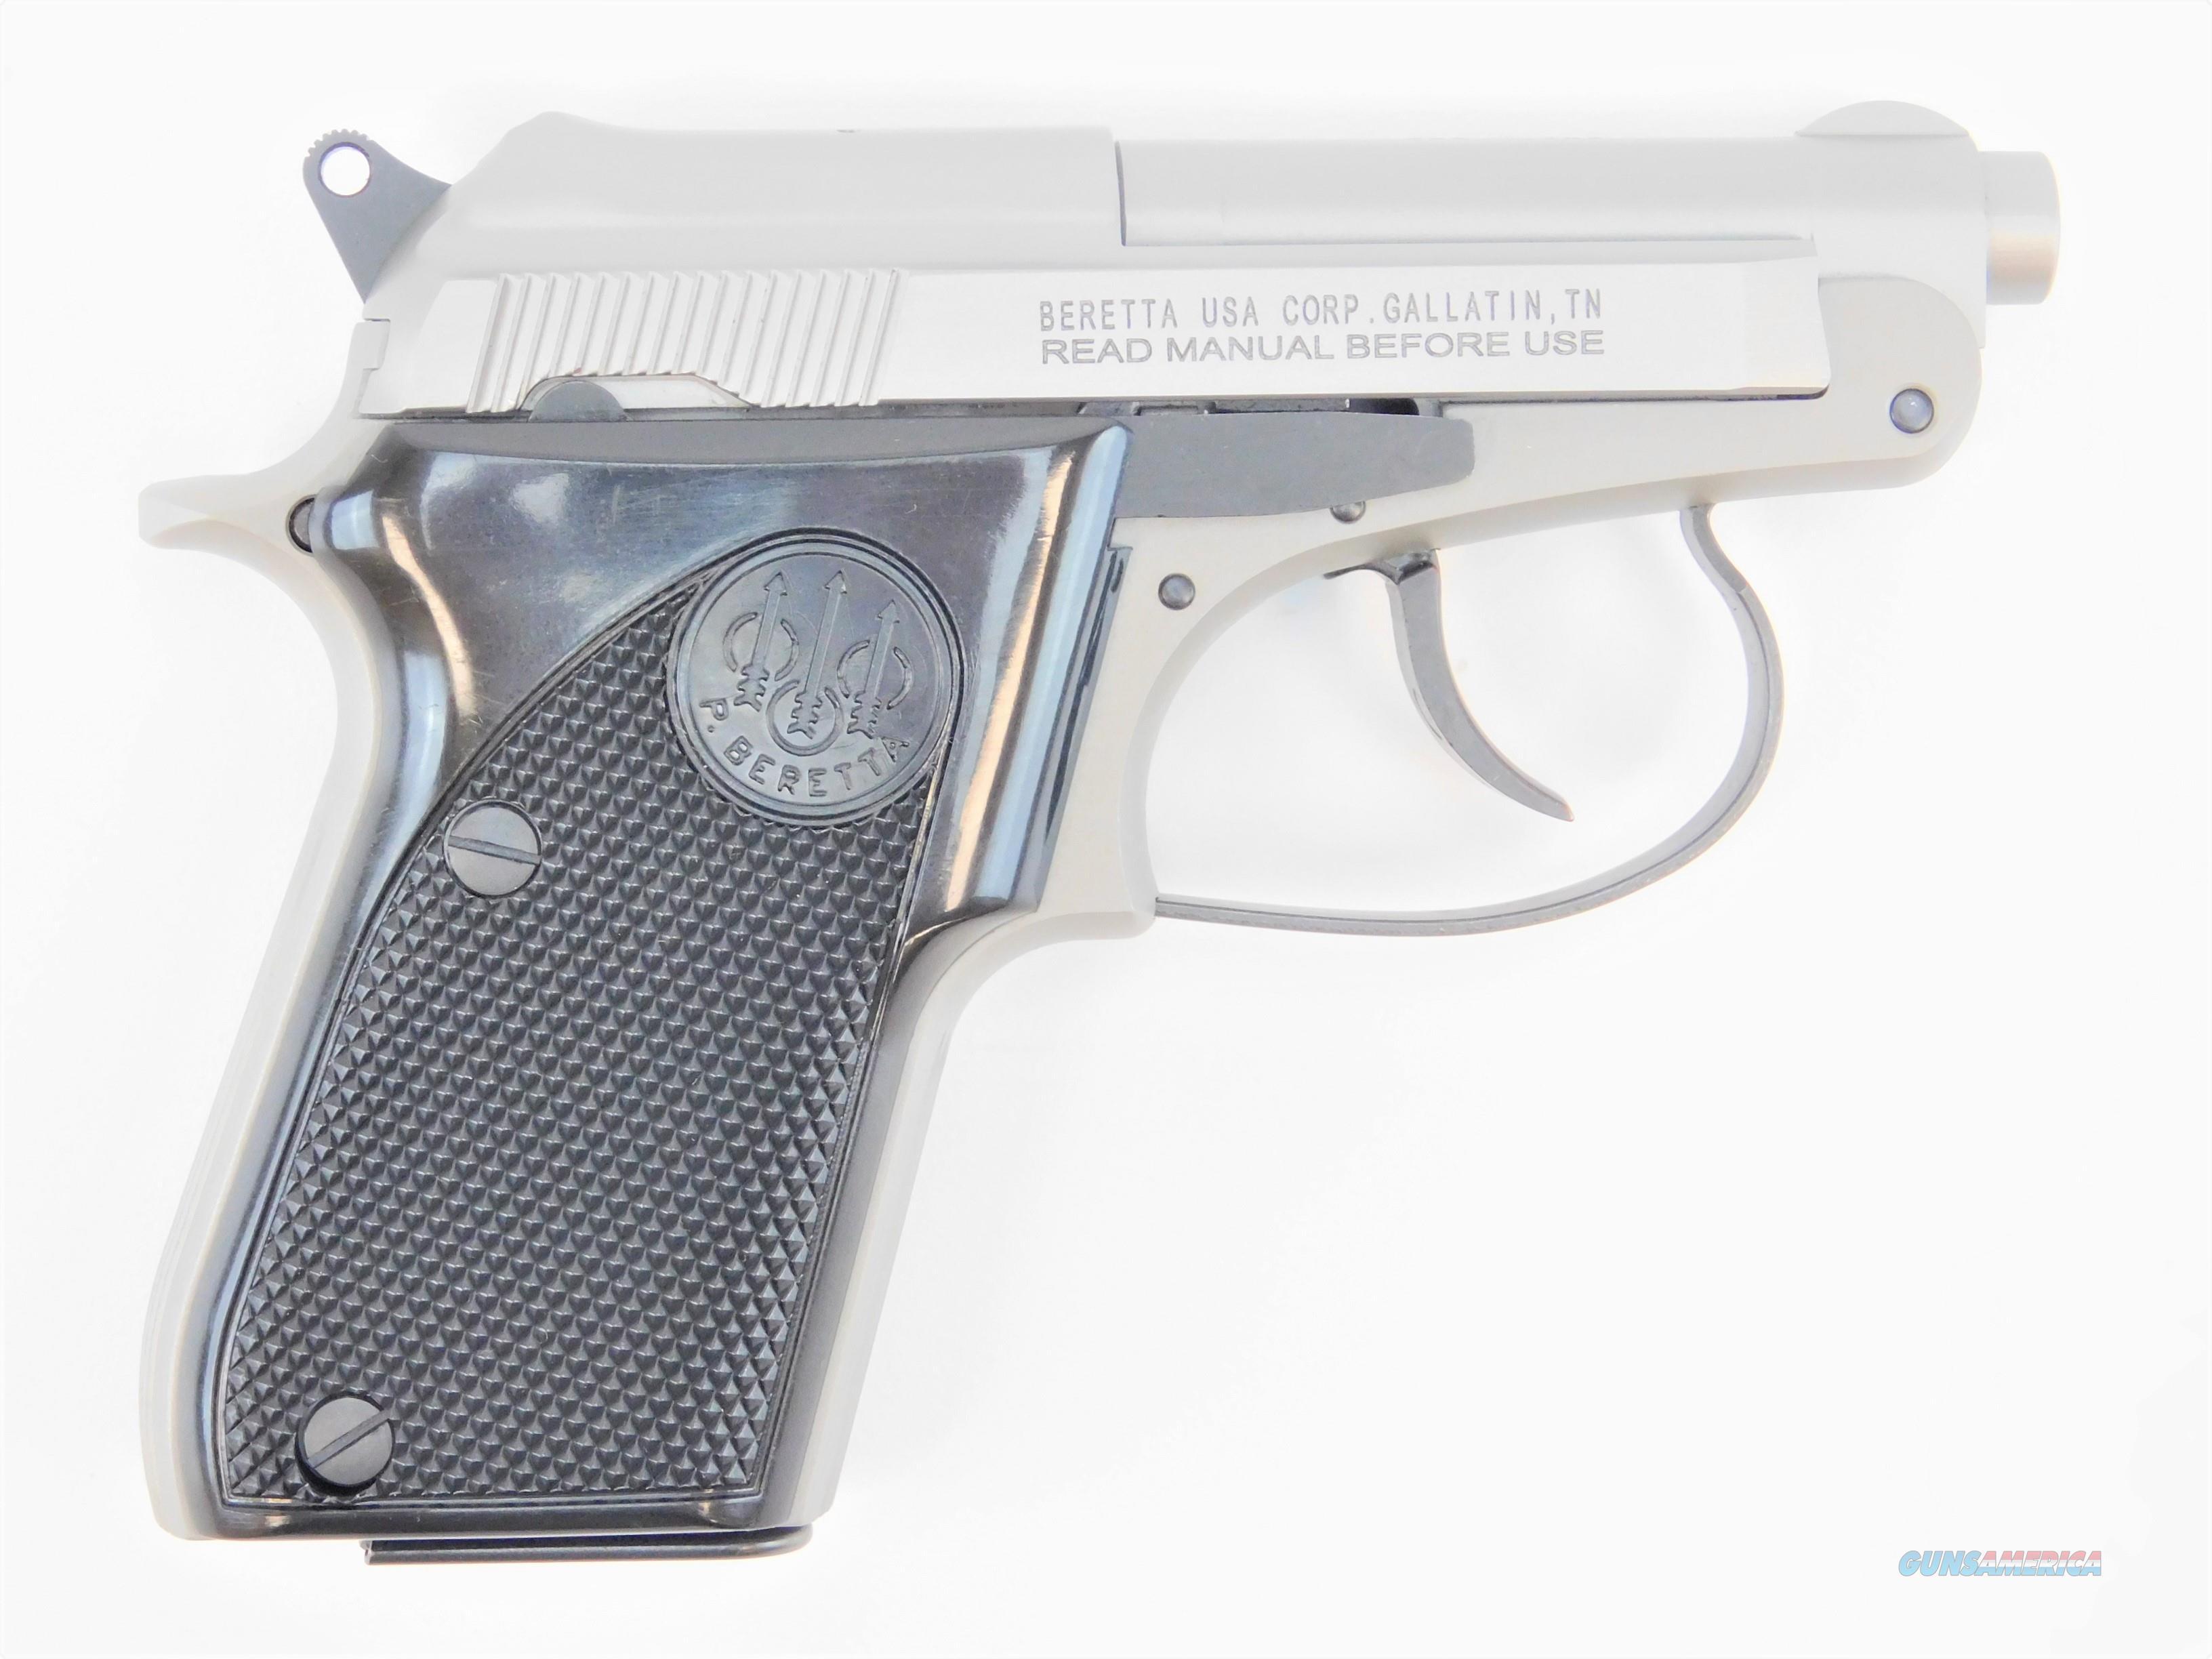 "Beretta 21 Bobcat Inox .22 LR 2.4"" 7 Rds J212500   Guns > Pistols > Beretta Pistols > Small Caliber Tip Out"